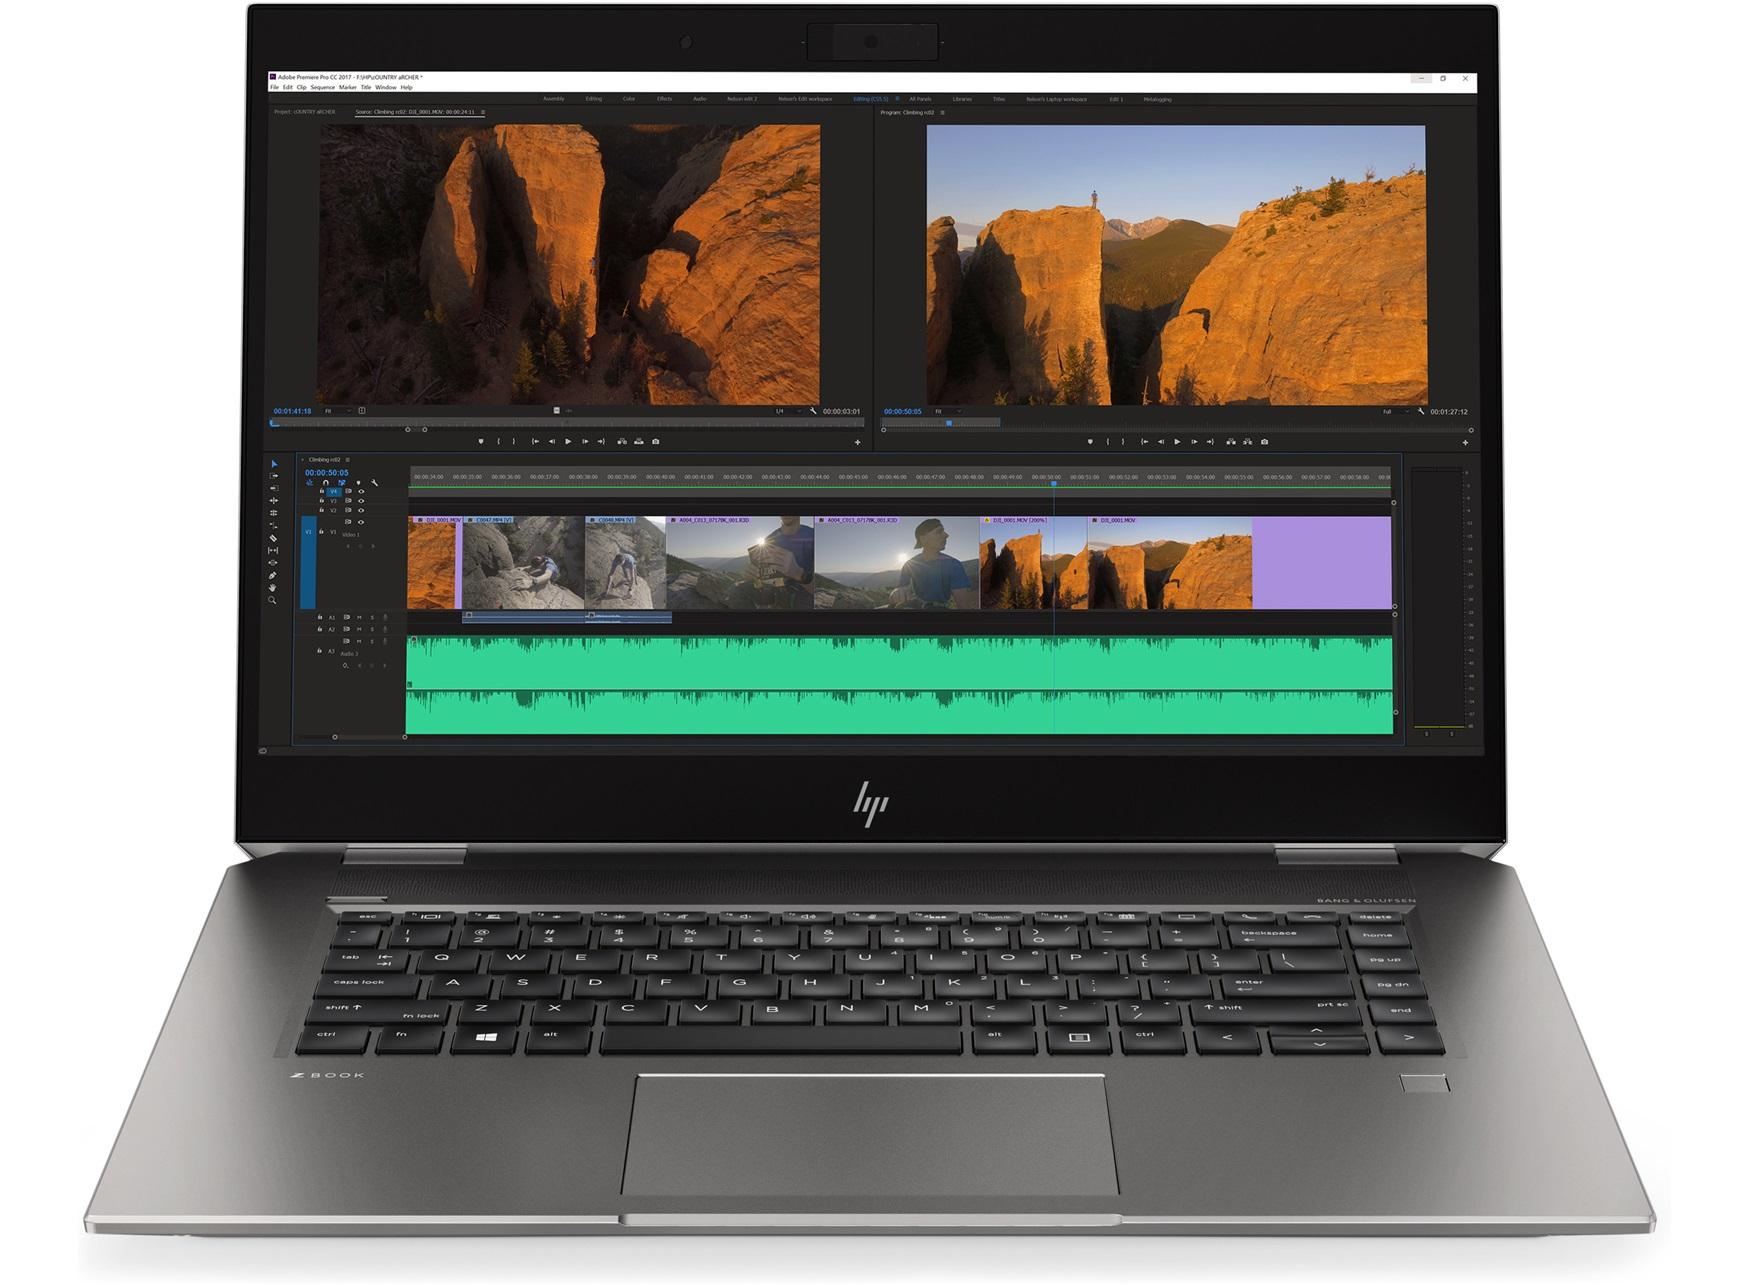 "HP ZBook Studio G5 Zilver Mobiel werkstation 39,6 cm (15.6"") 1920 x 1080 Pixels Intel® 9ste generatie Core™ i7 16 GB DDR4-SDRAM 512 GB SSD Windows 10 Pro"